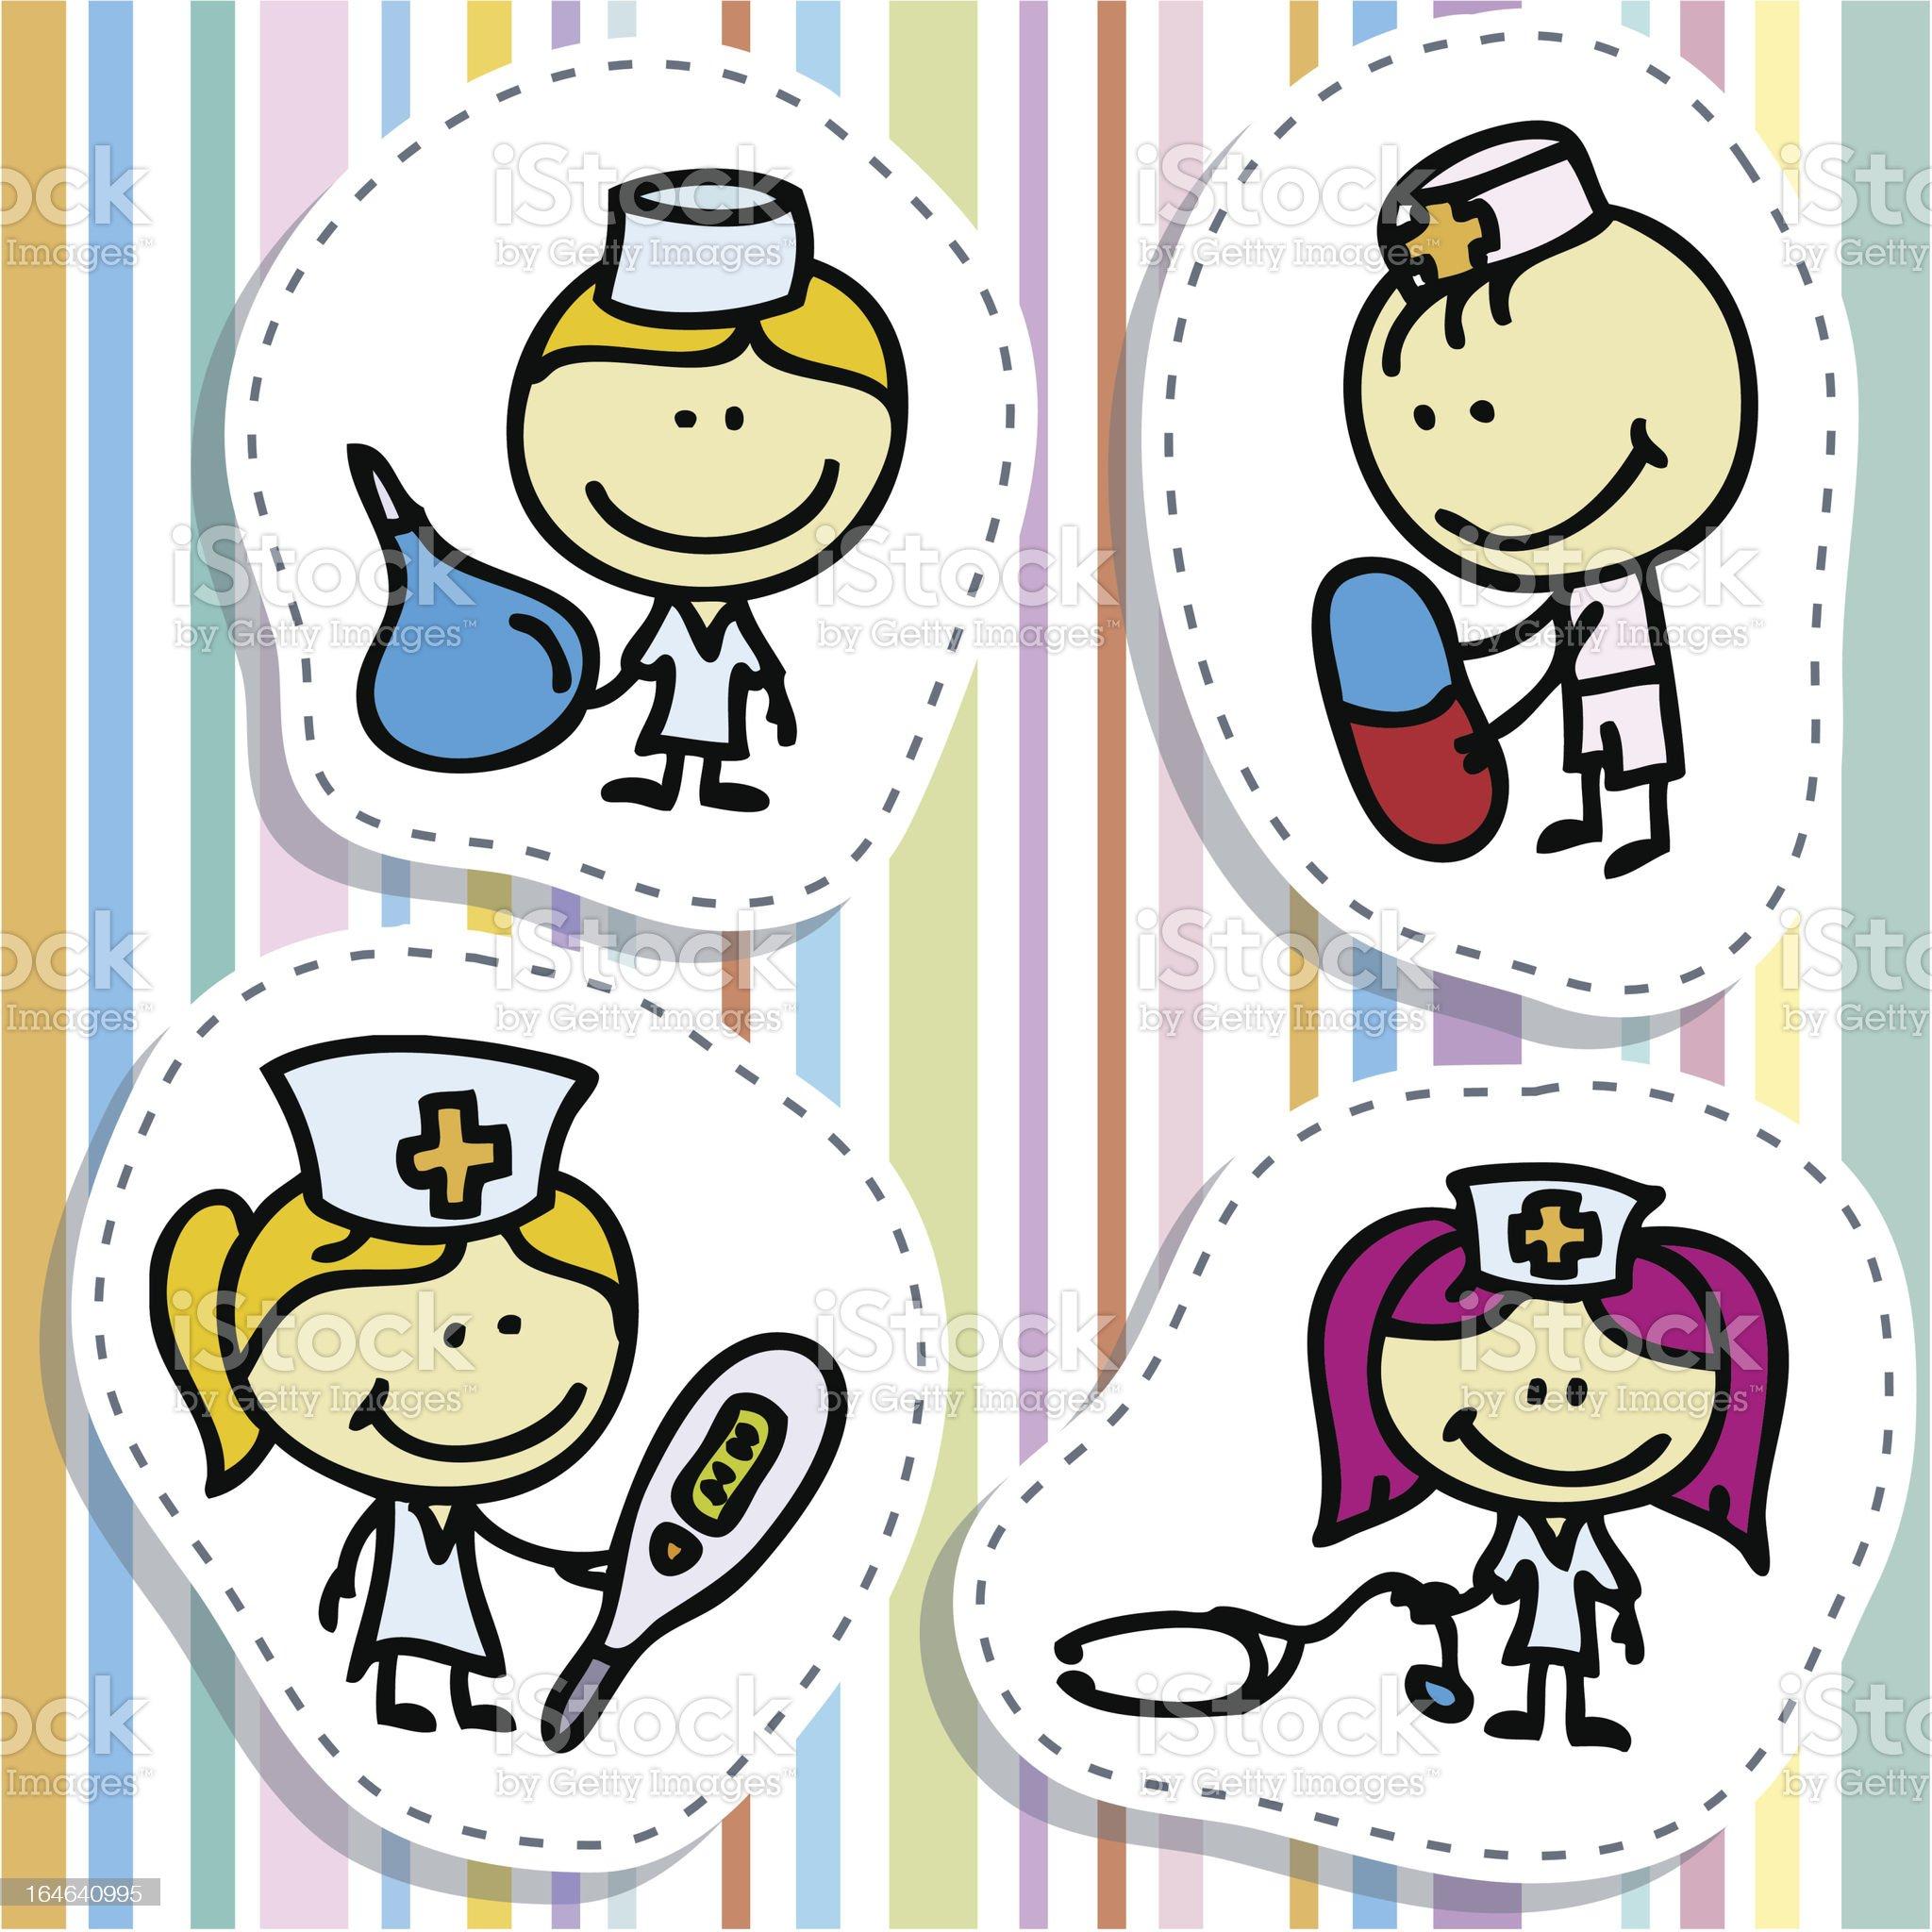 Doctor kids royalty-free stock vector art